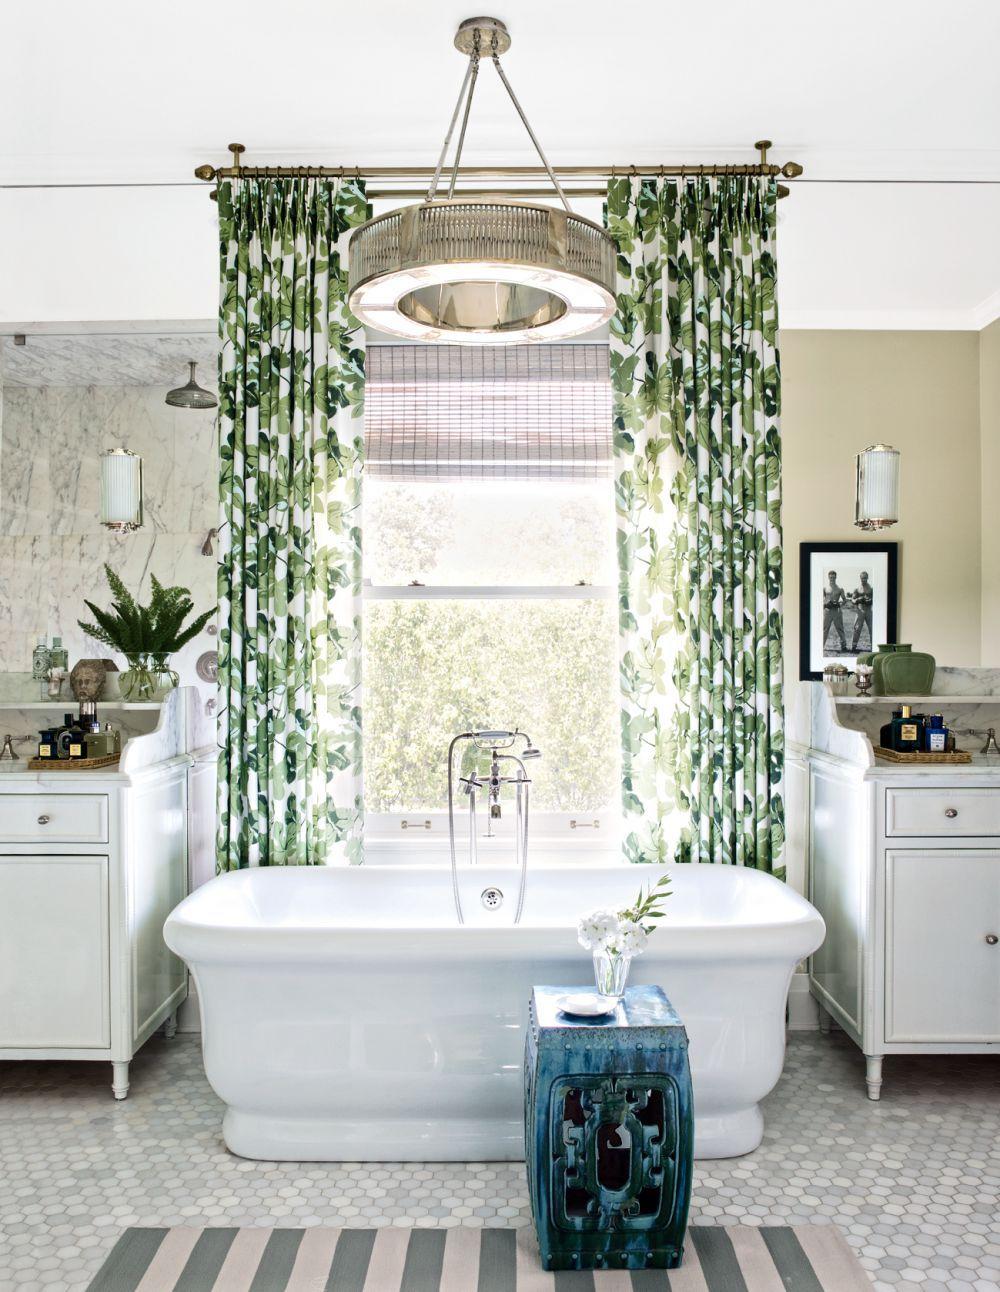 banana leaf curtains garden stool honey comb tiles better decorating ...